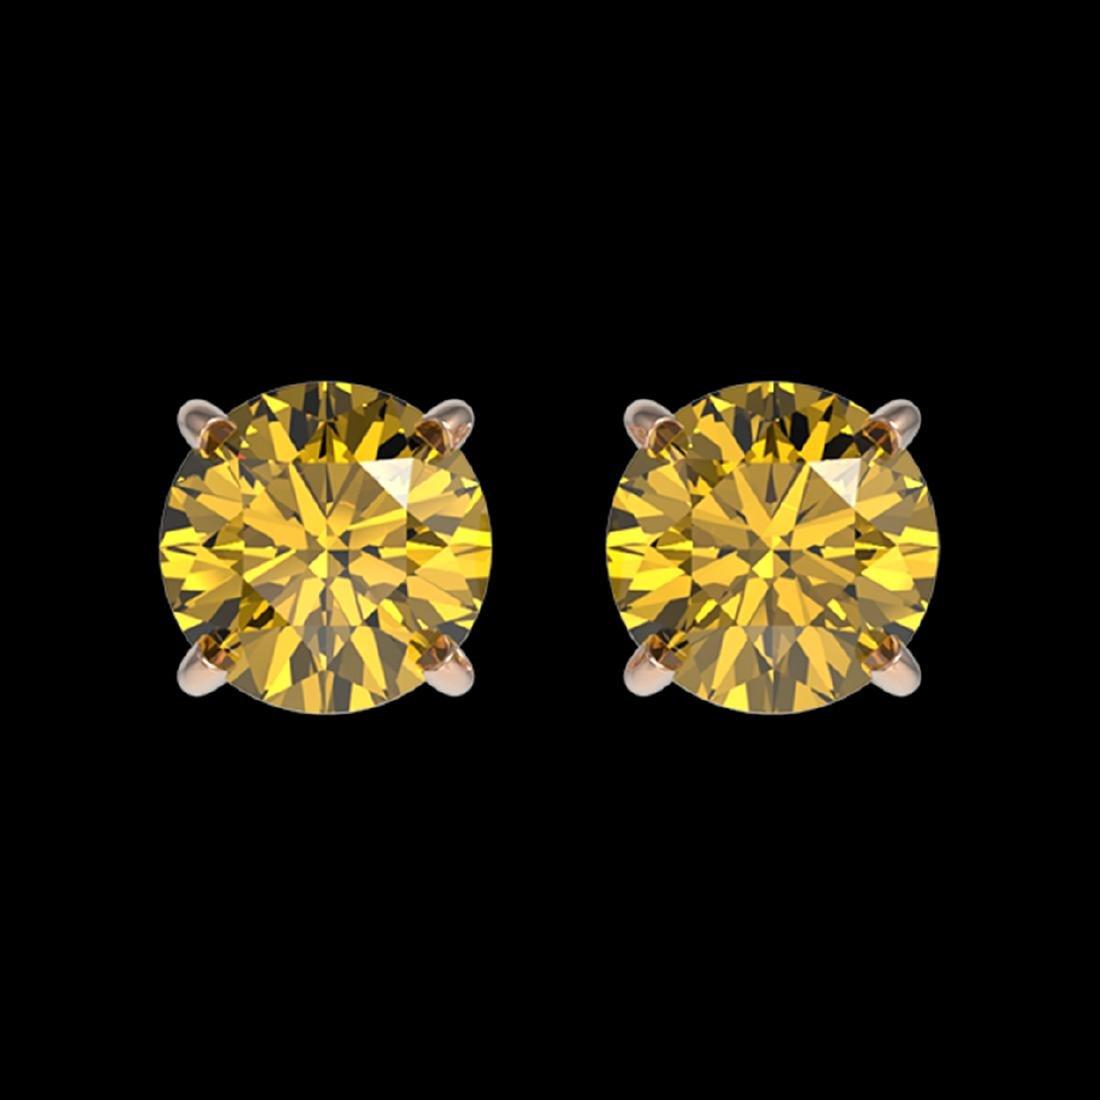 1.04 ctw Intense Yellow Diamond Stud Earrings 10K Rose